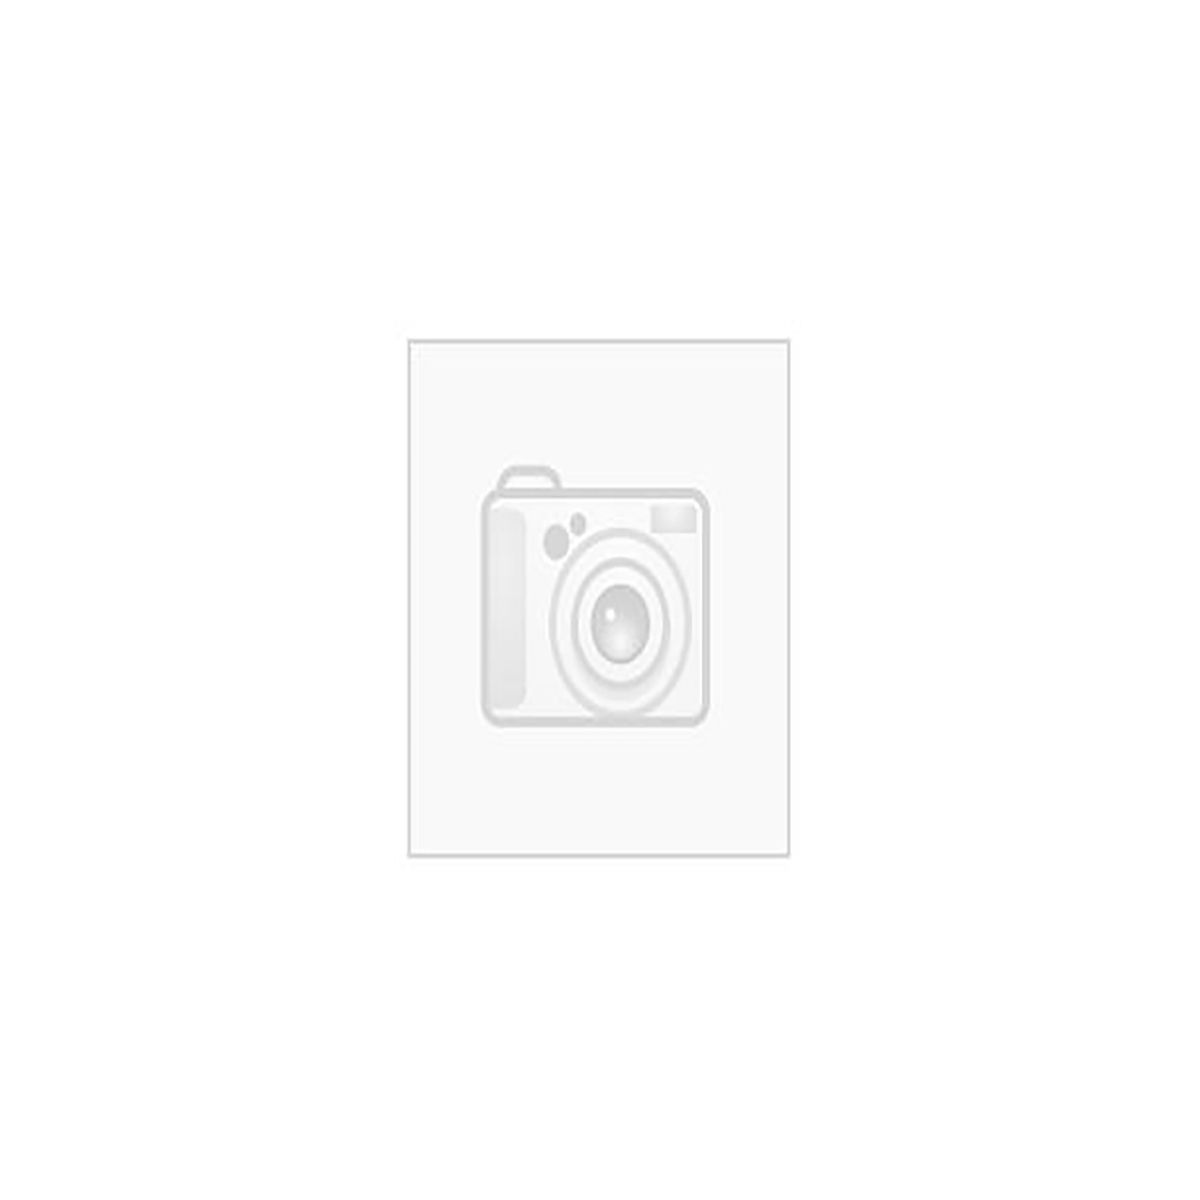 FRESH Ventilation - Baderomsvifte Intellivent SKY